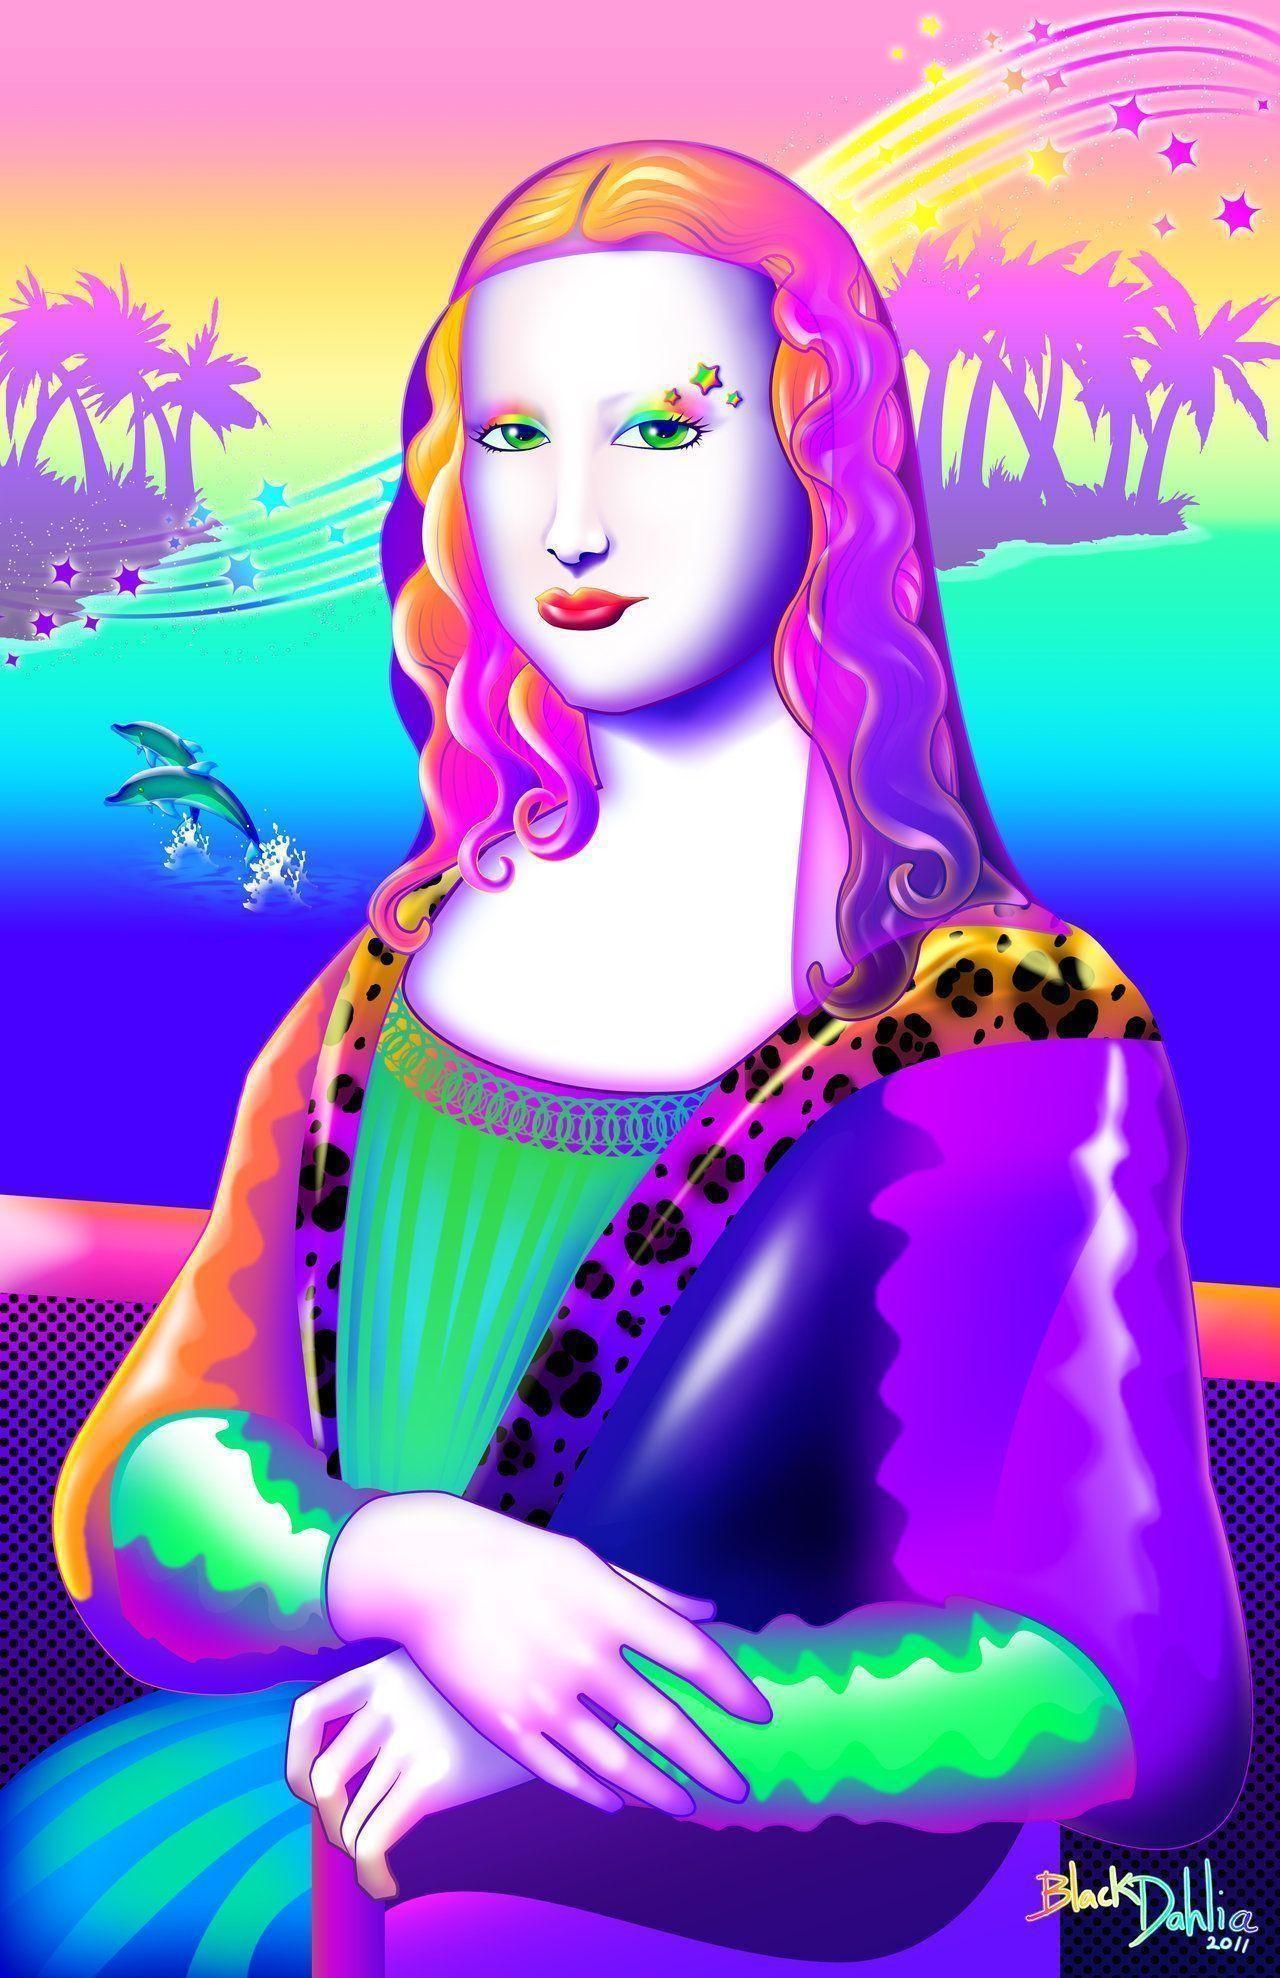 DeviantArt: More Like Mona Lisa Frank by blackdahlia